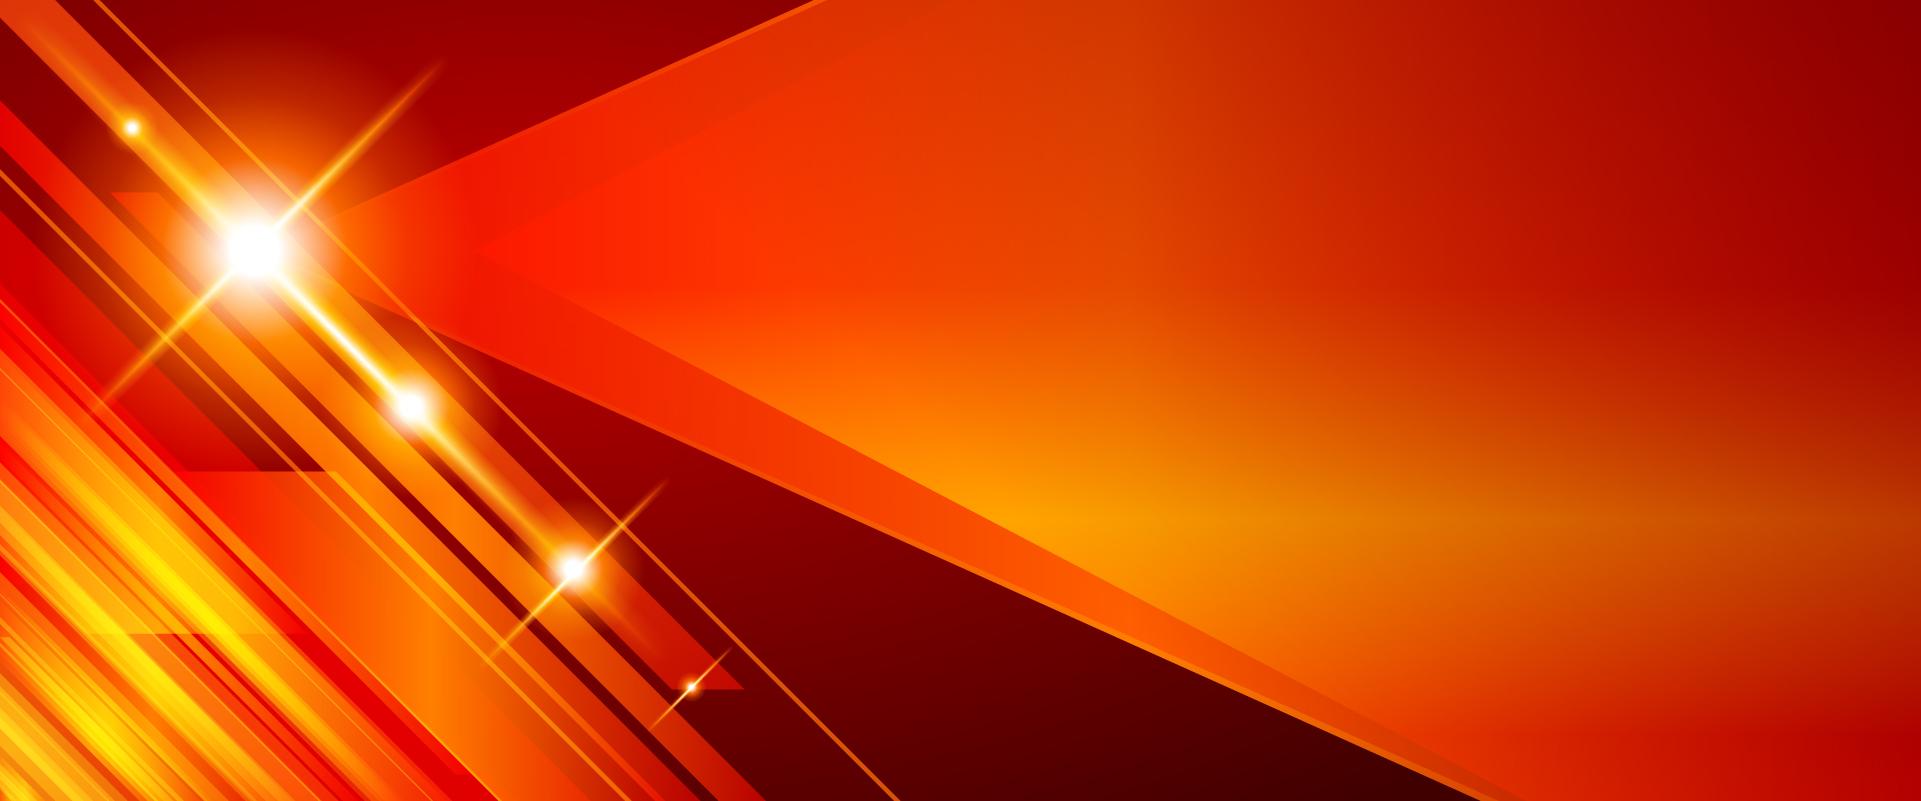 Diseño Arte Patrón Fondos De Pantalla Antecedentes: Diseño La Luz Fondos De Pantalla Arte Antecedentes